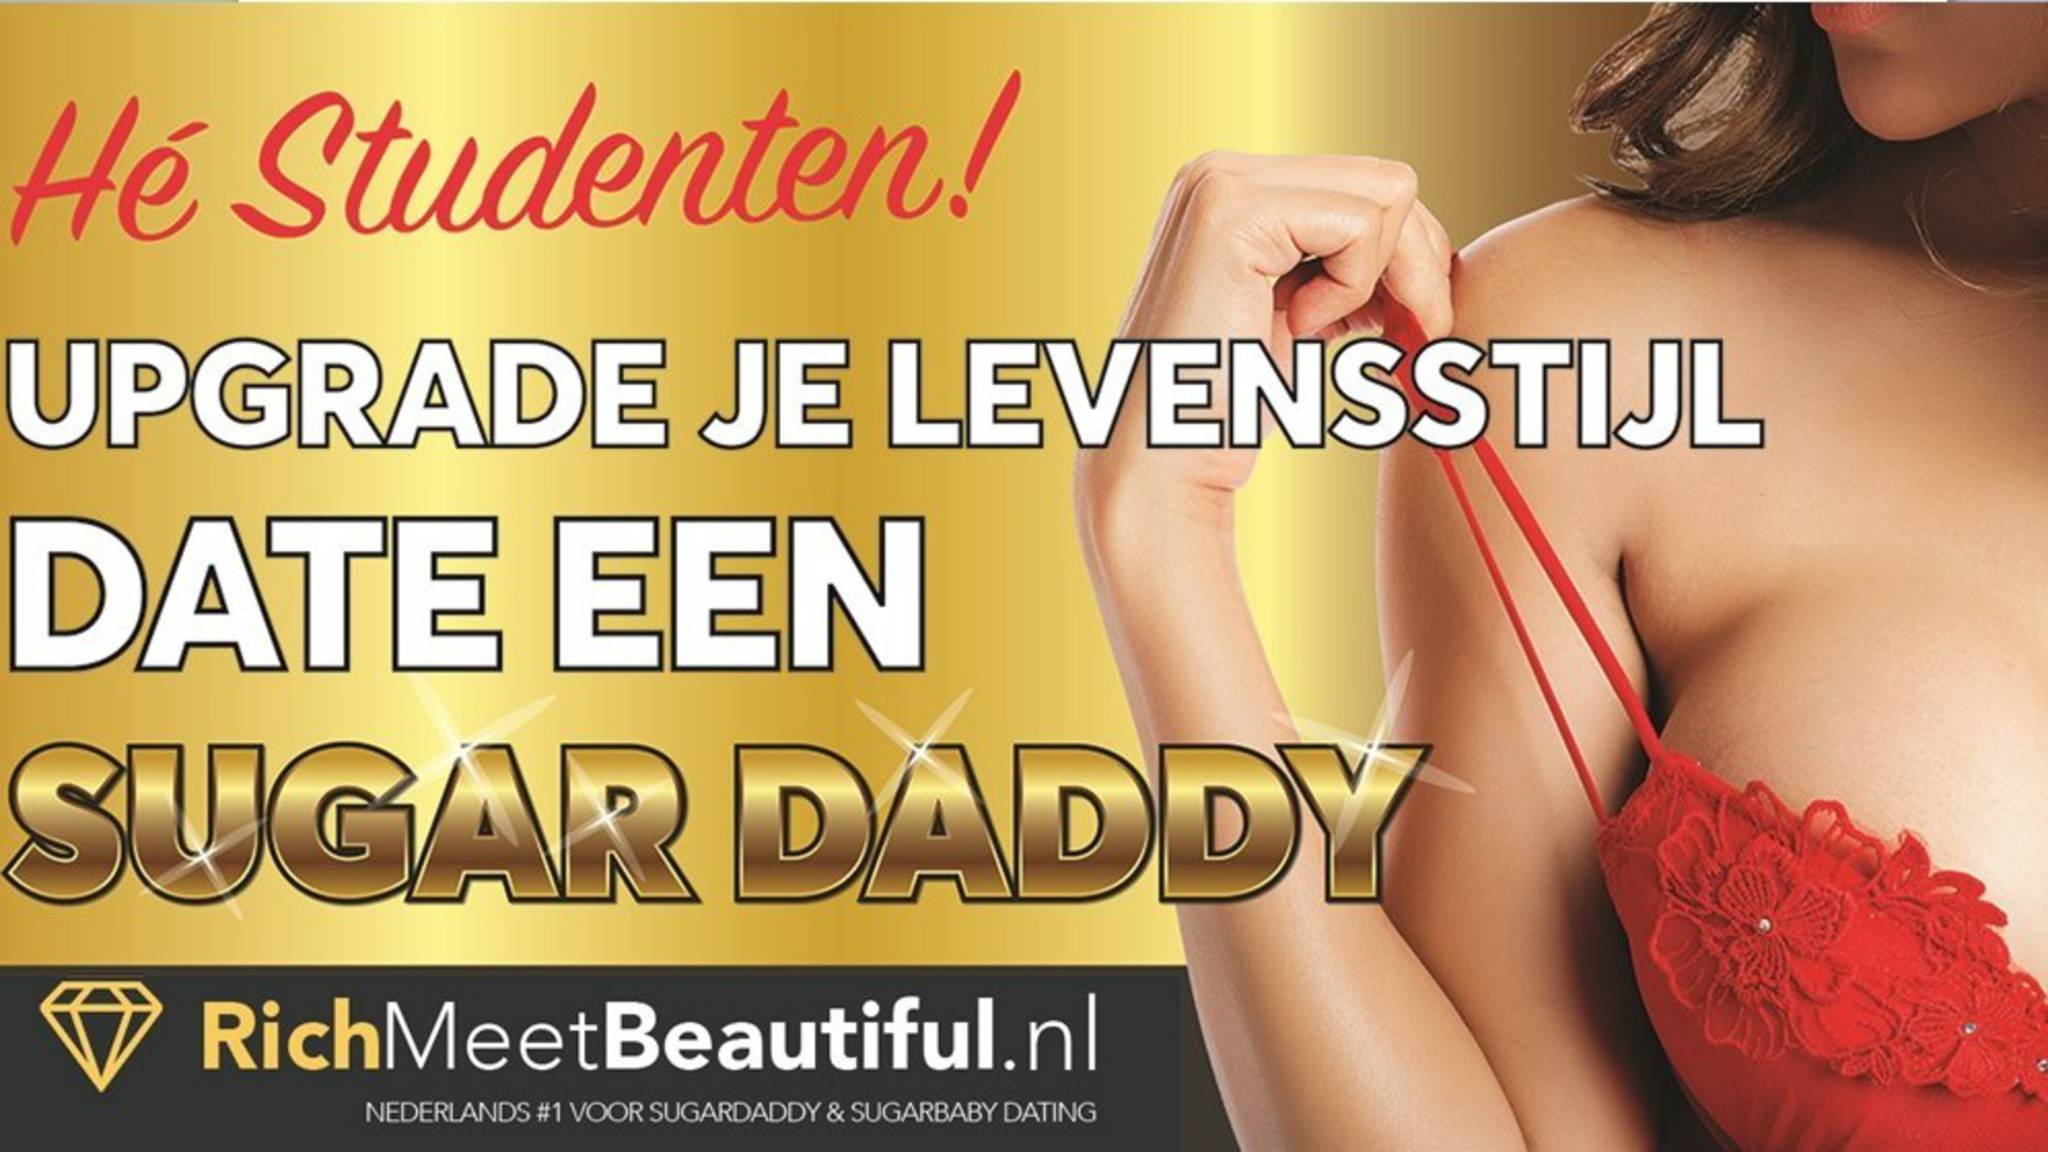 Online dating prostituee oplichting